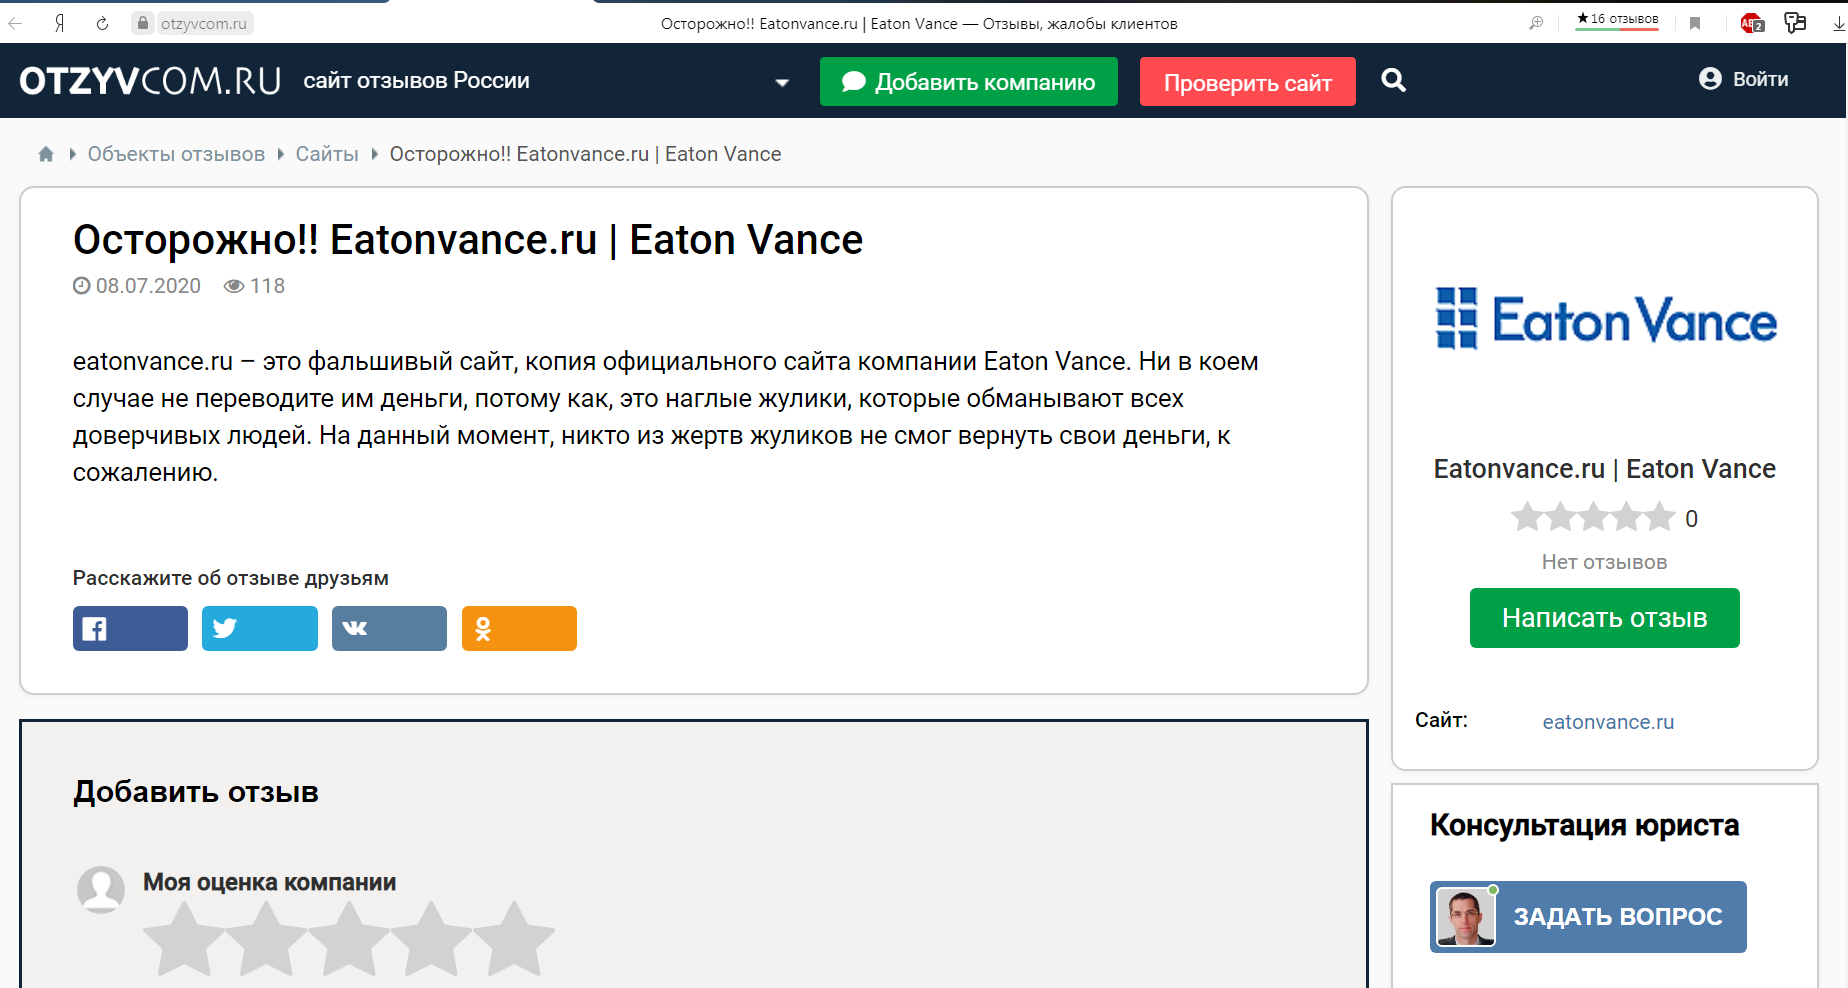 eaton vance отзывы